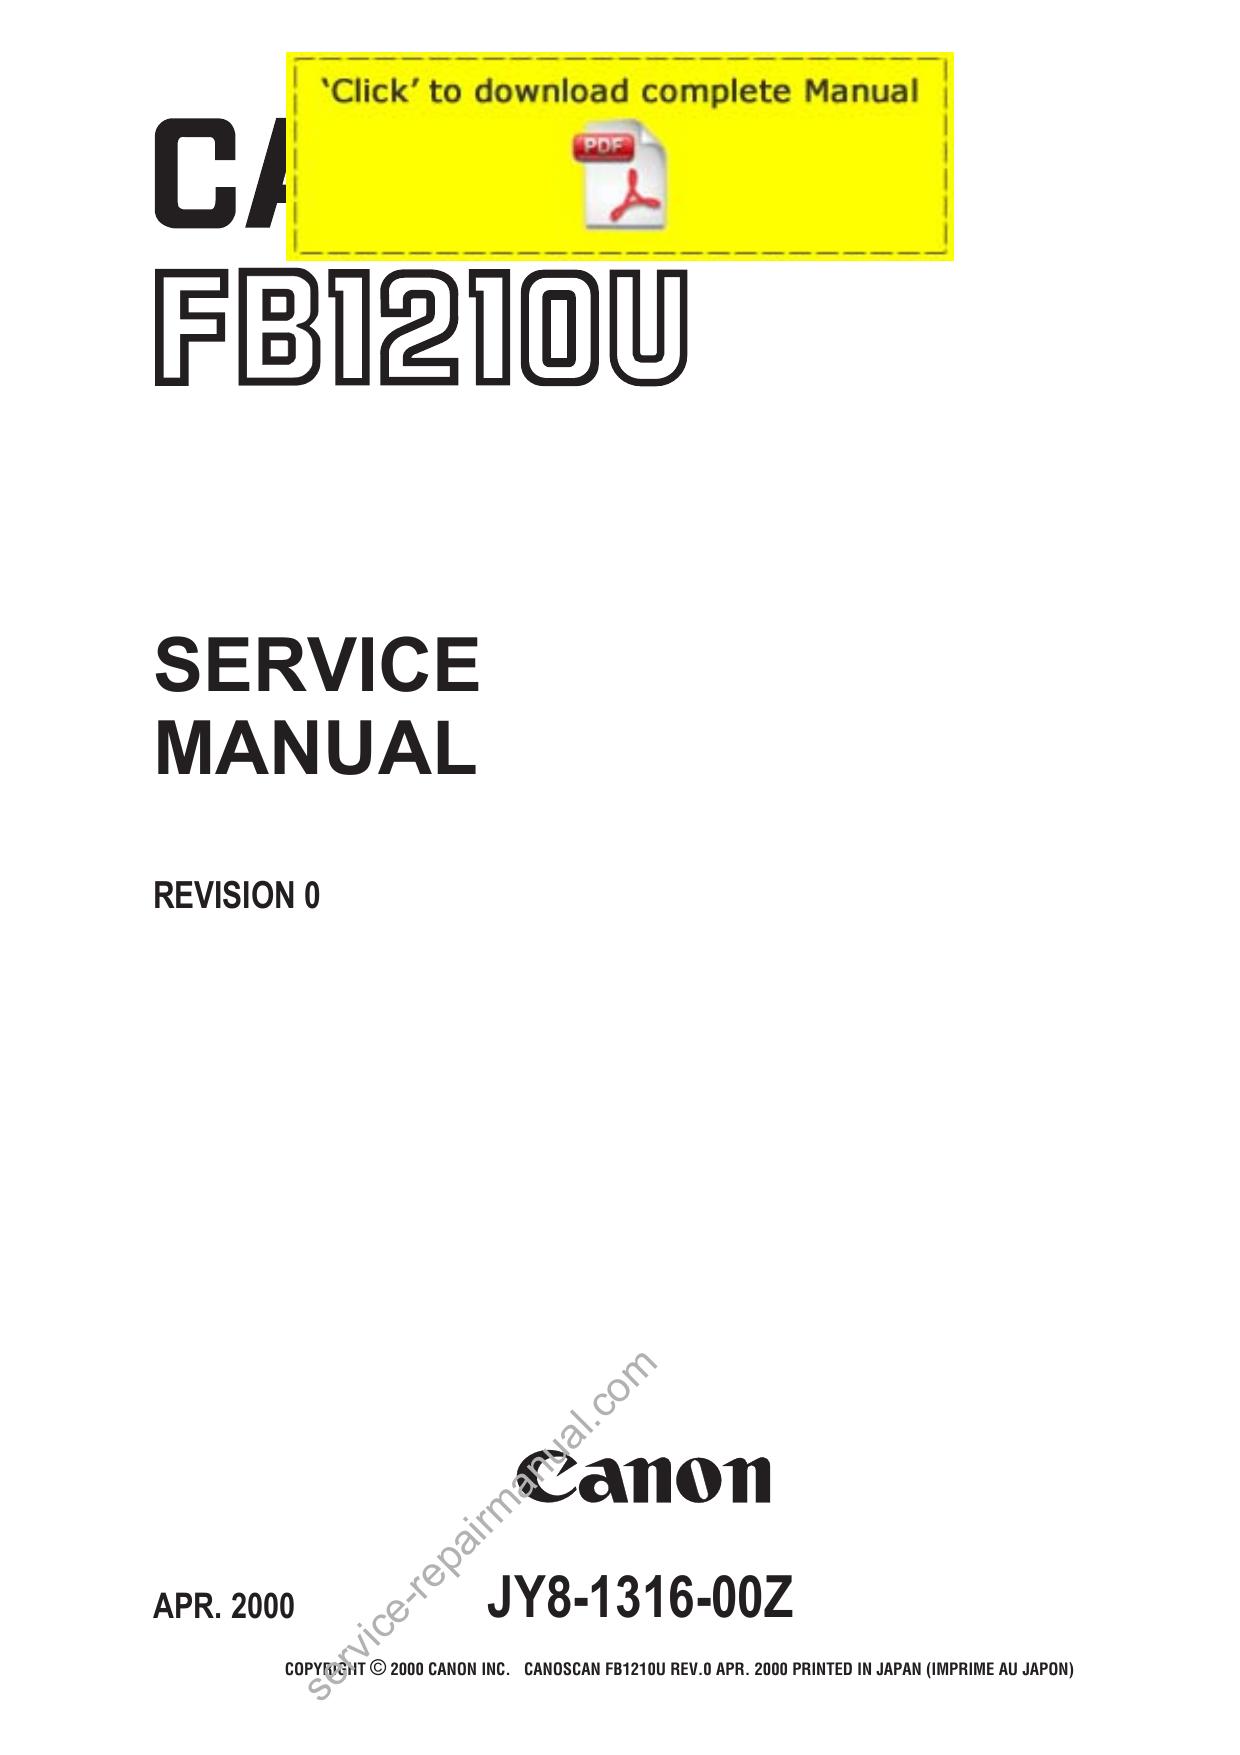 CANON CANOSCAN FB1210U WINDOWS 7 64BIT DRIVER DOWNLOAD